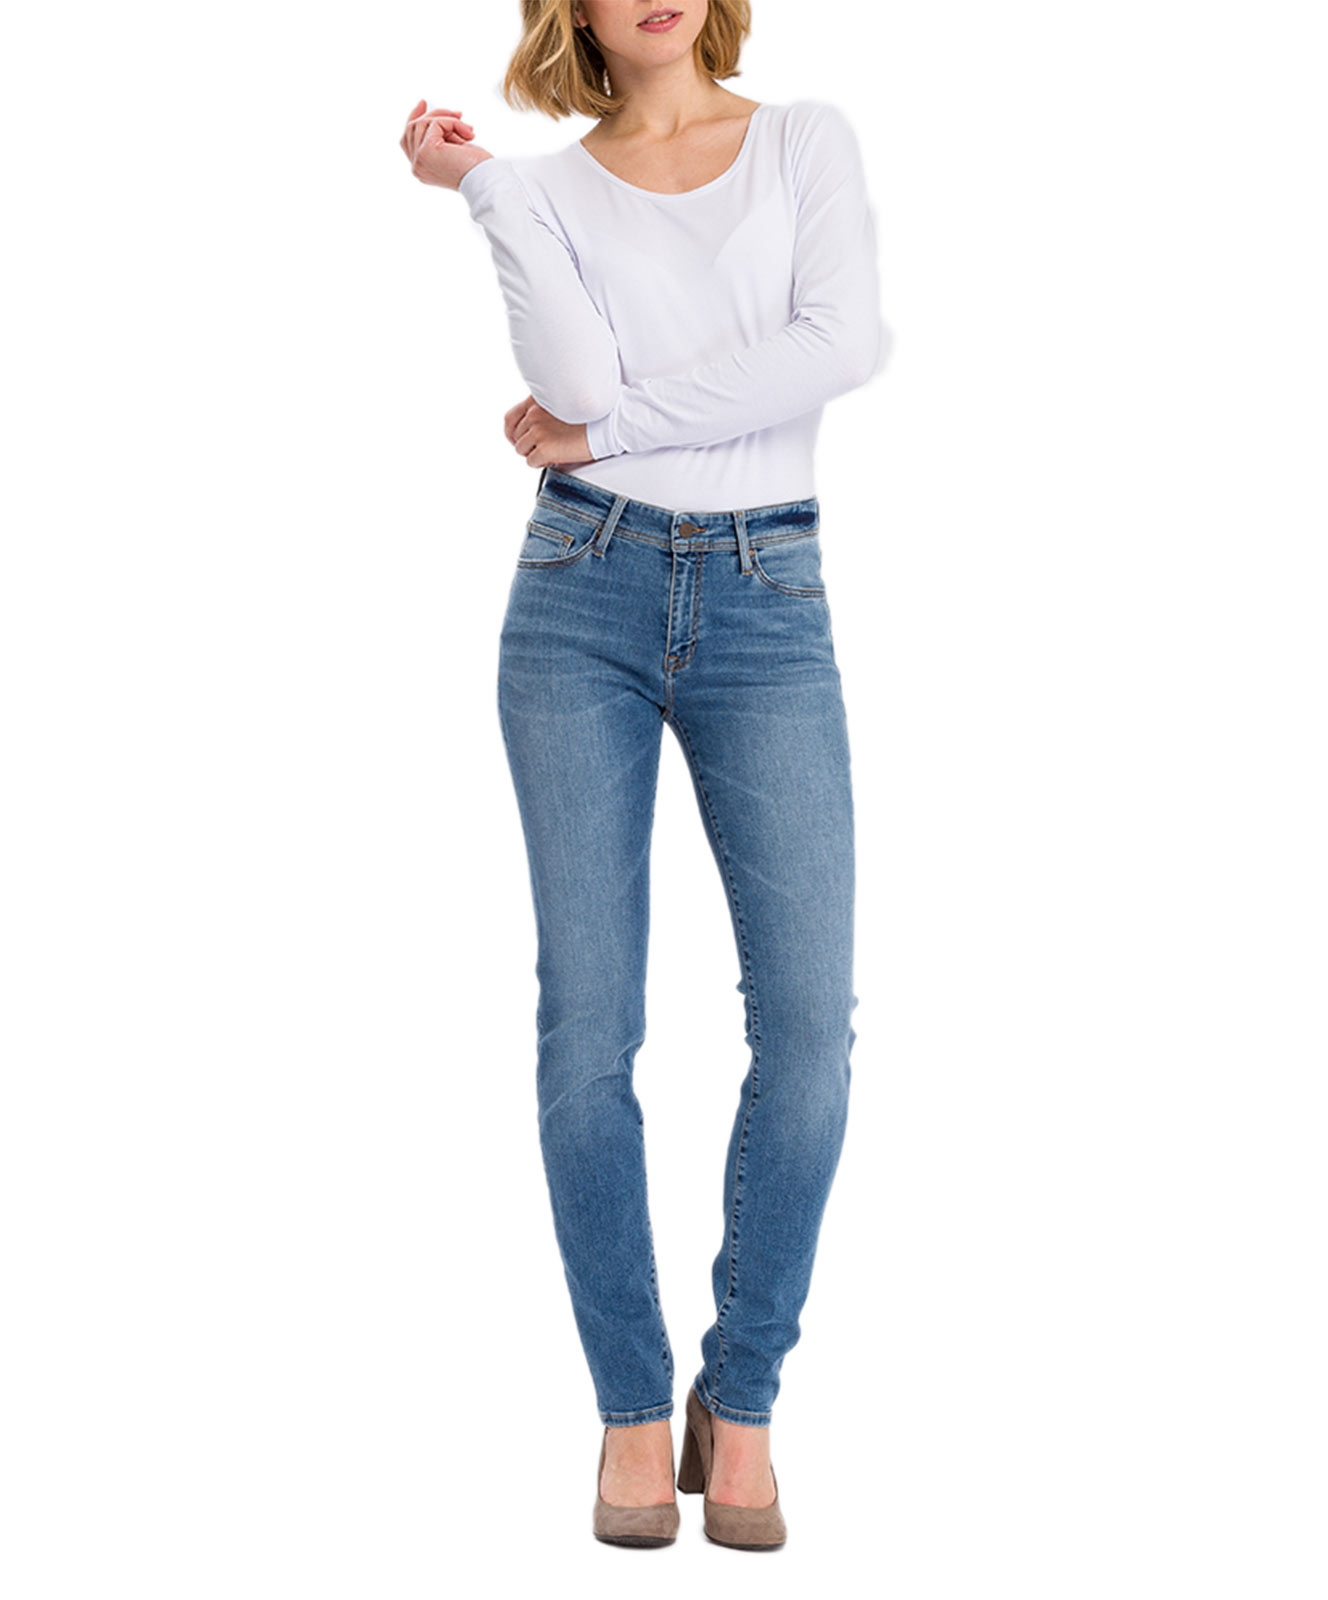 Hosen - Cross Mom Jeans Anya in Light Mid Blue  - Onlineshop Jeans Meile